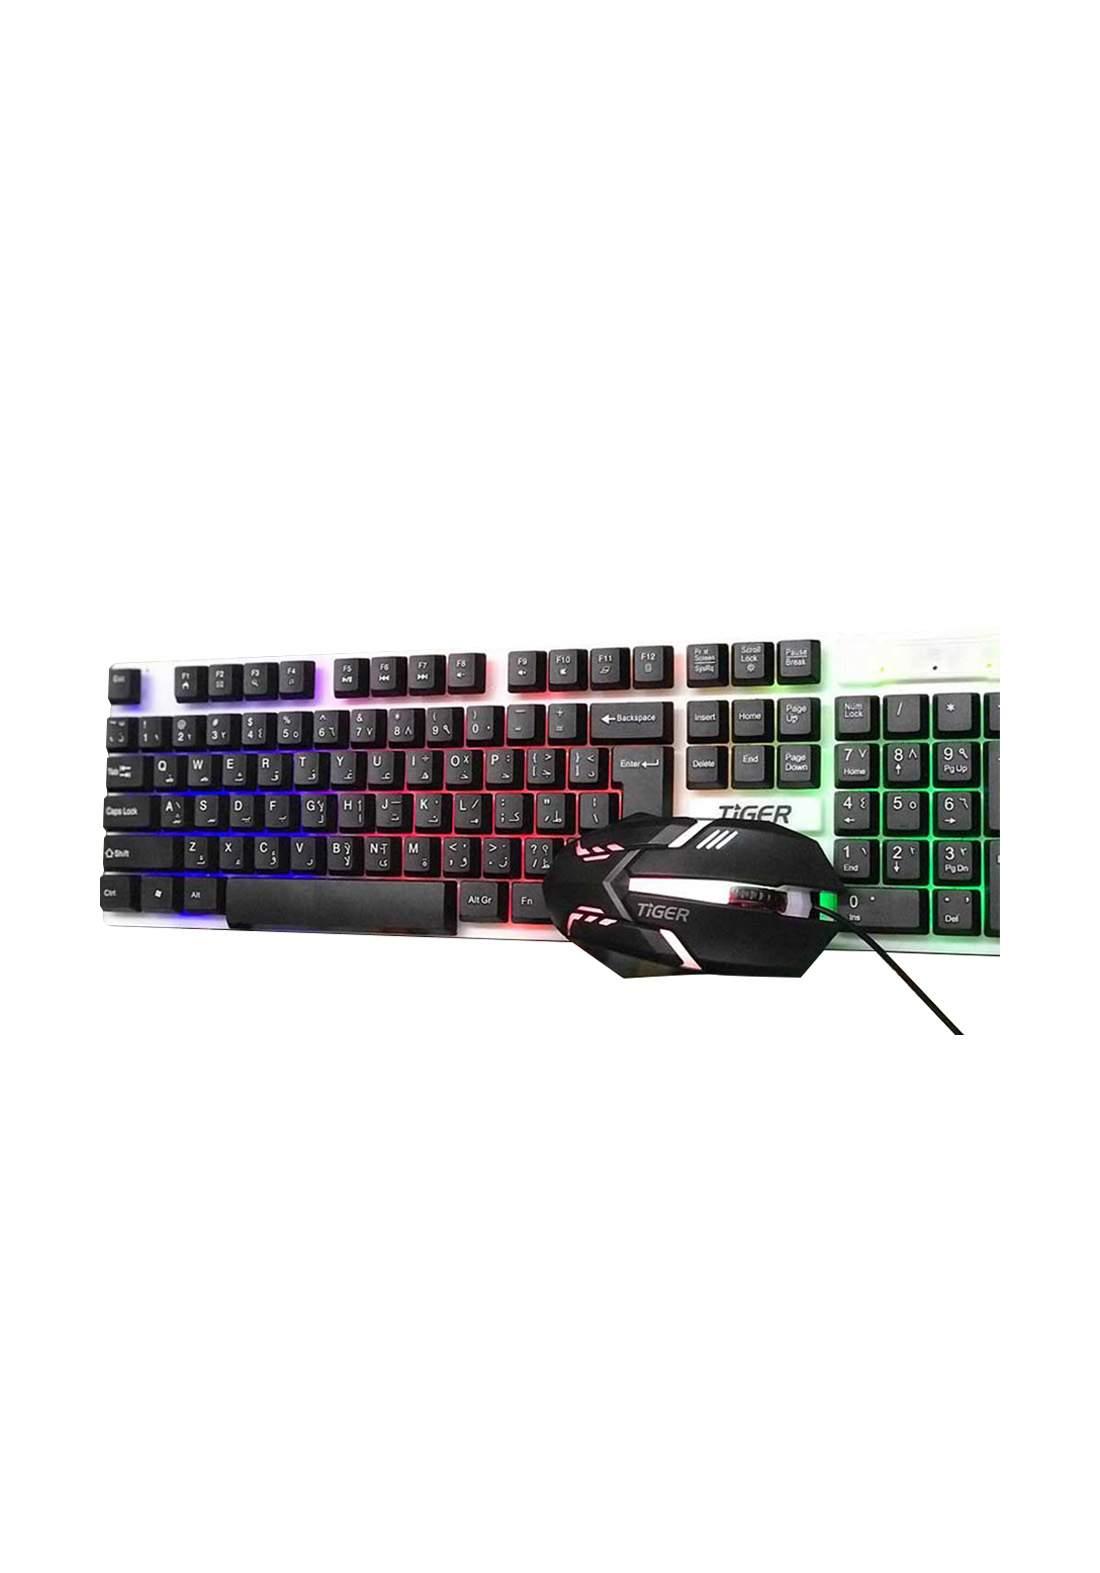 Tiger XG-1 RGB Combo Keyboard And Mouse Gaming - Black  لوحة مفاتيح وفأرة